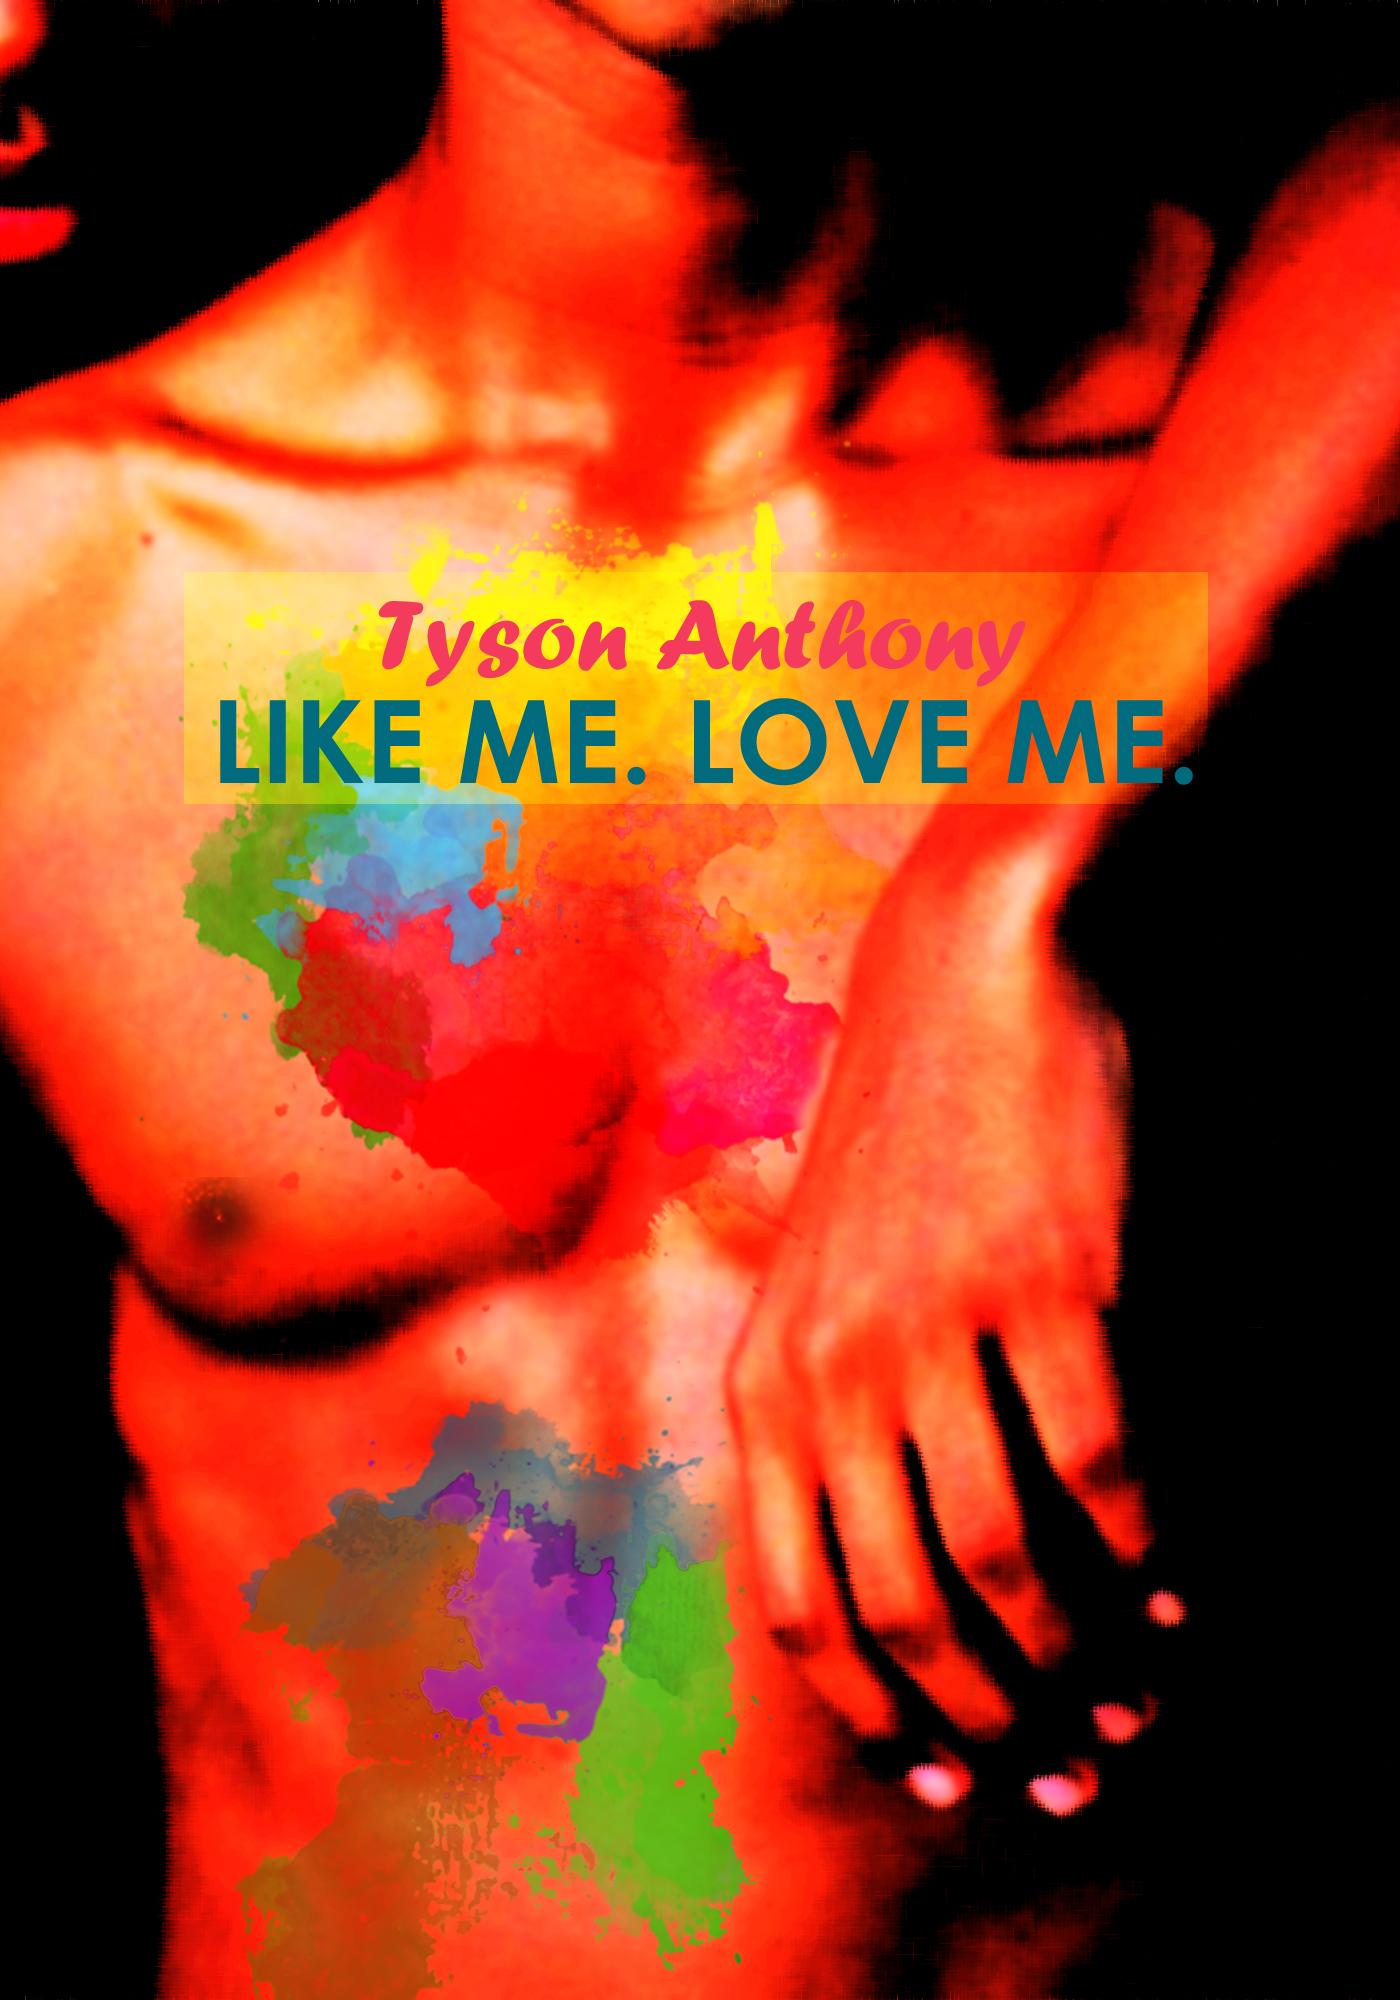 Like Me. Love Me.